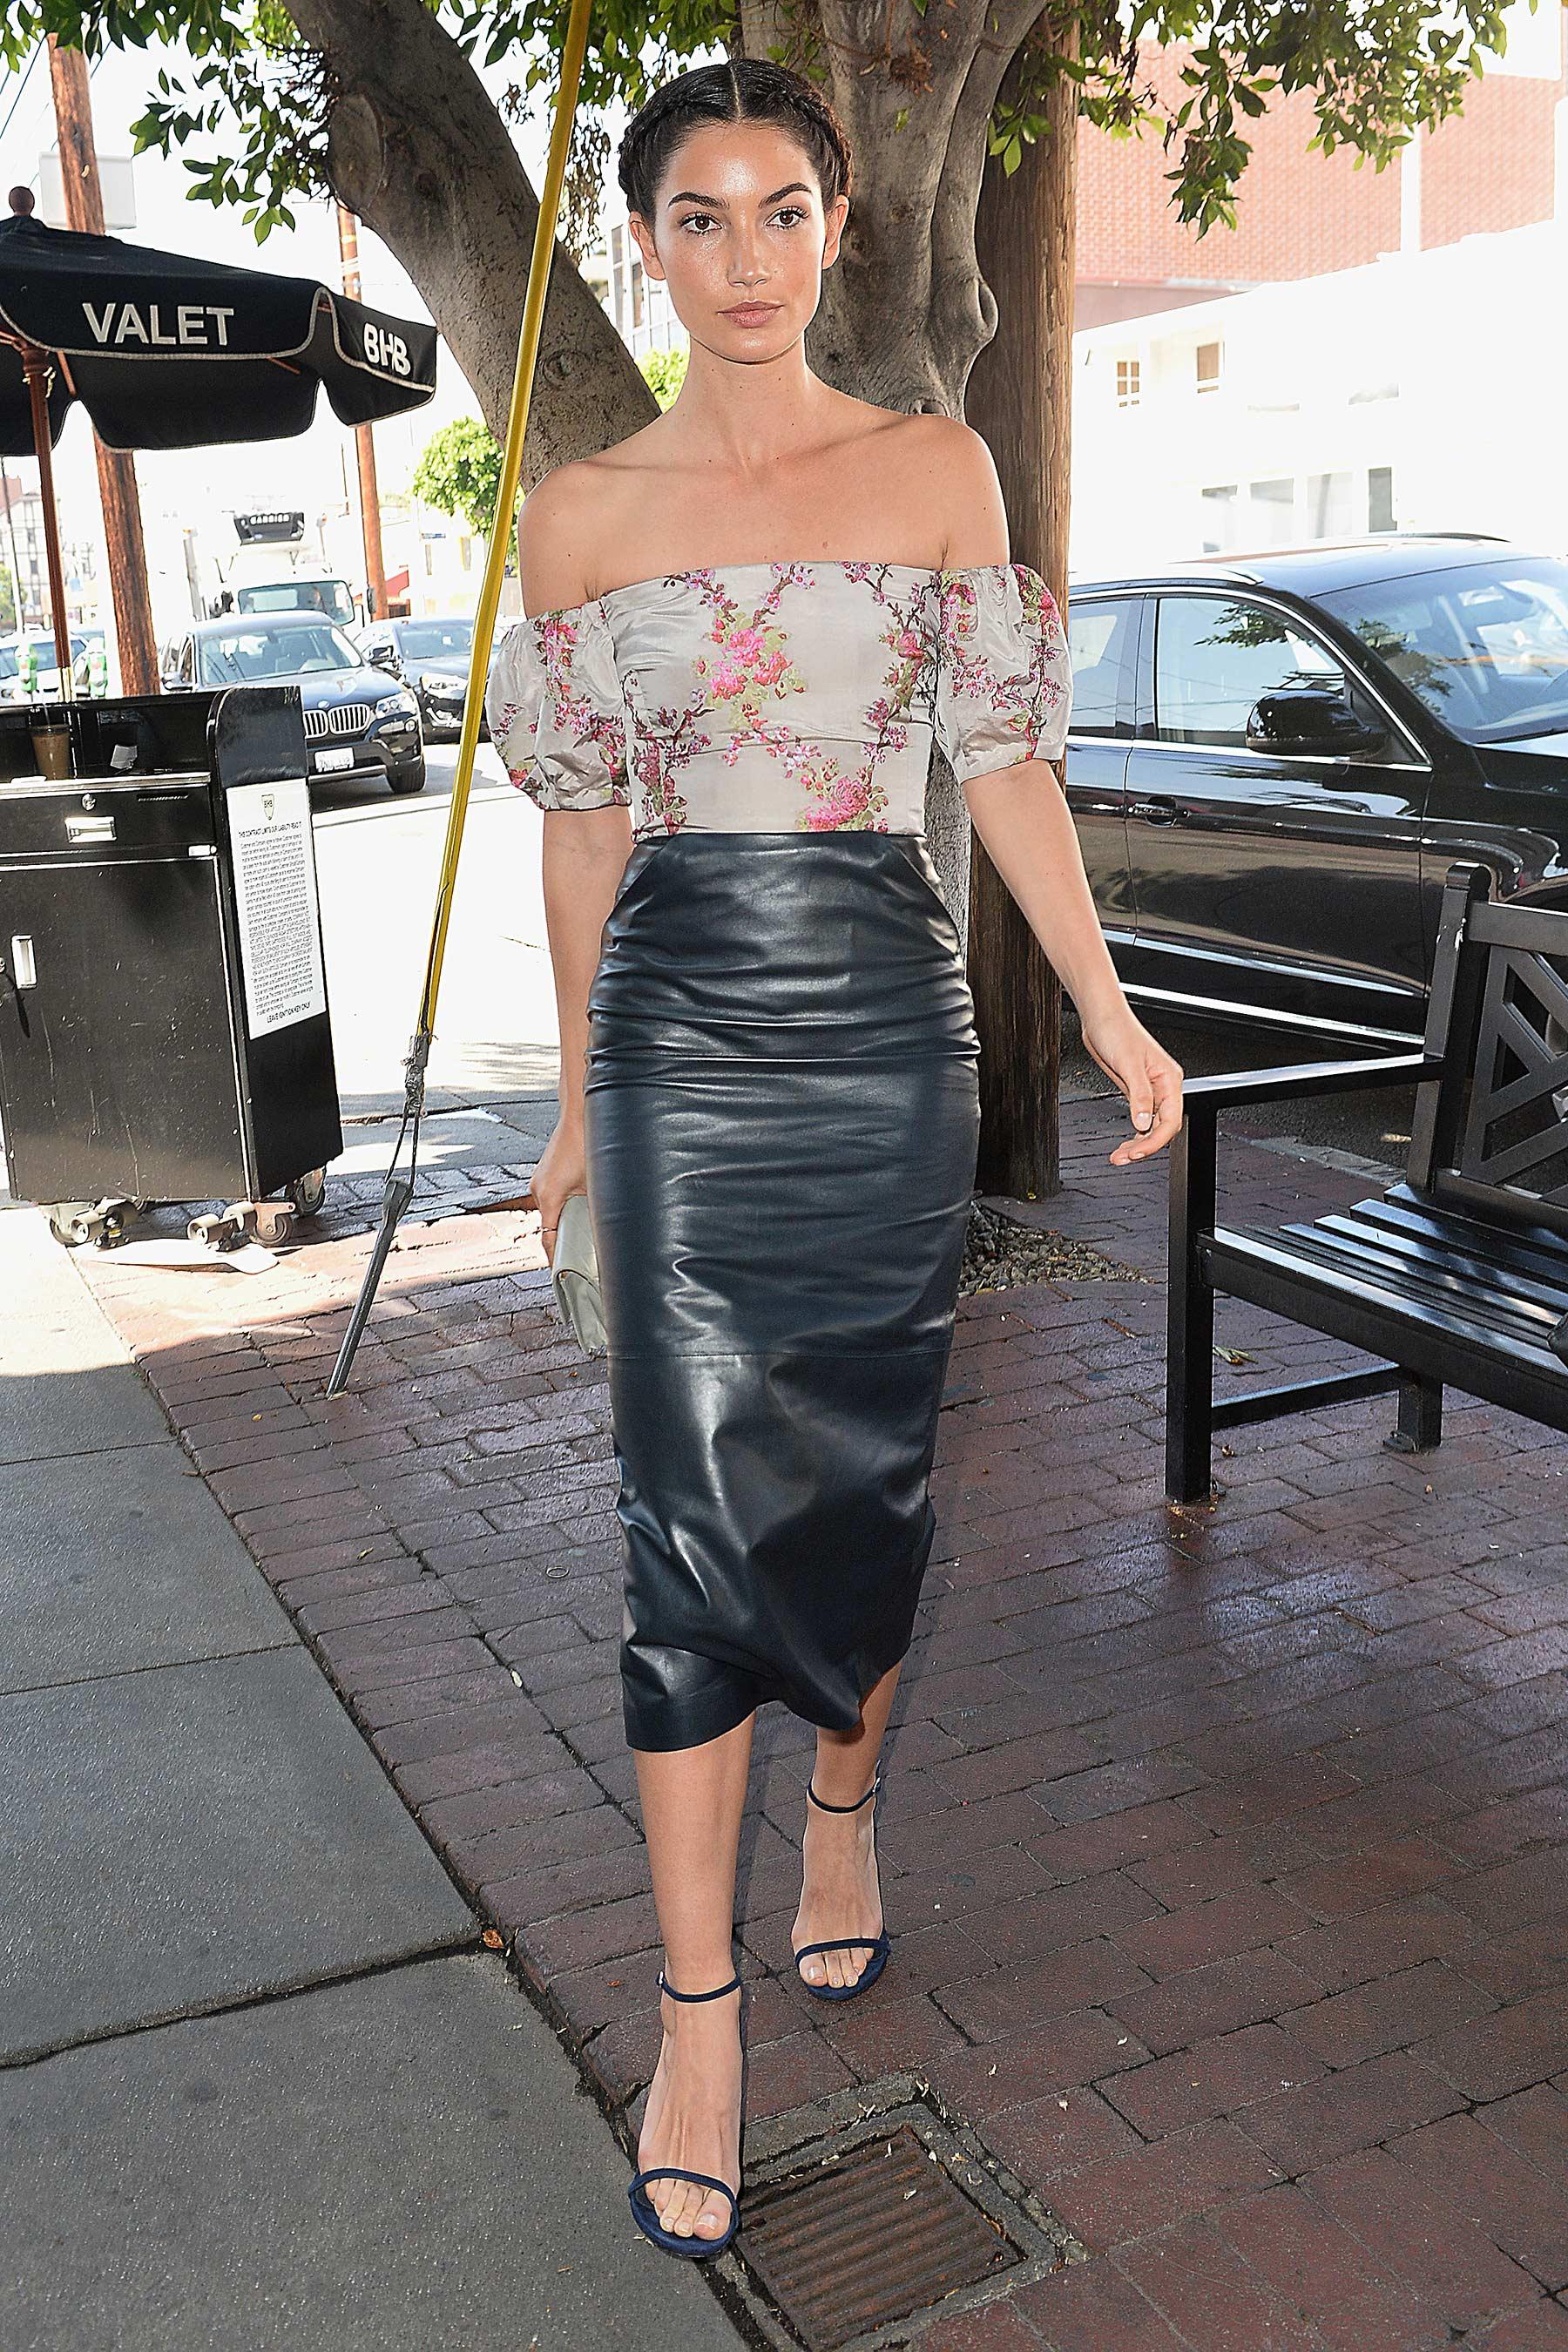 Lily Aldridge arrives at the Vanity Fair Luncheon